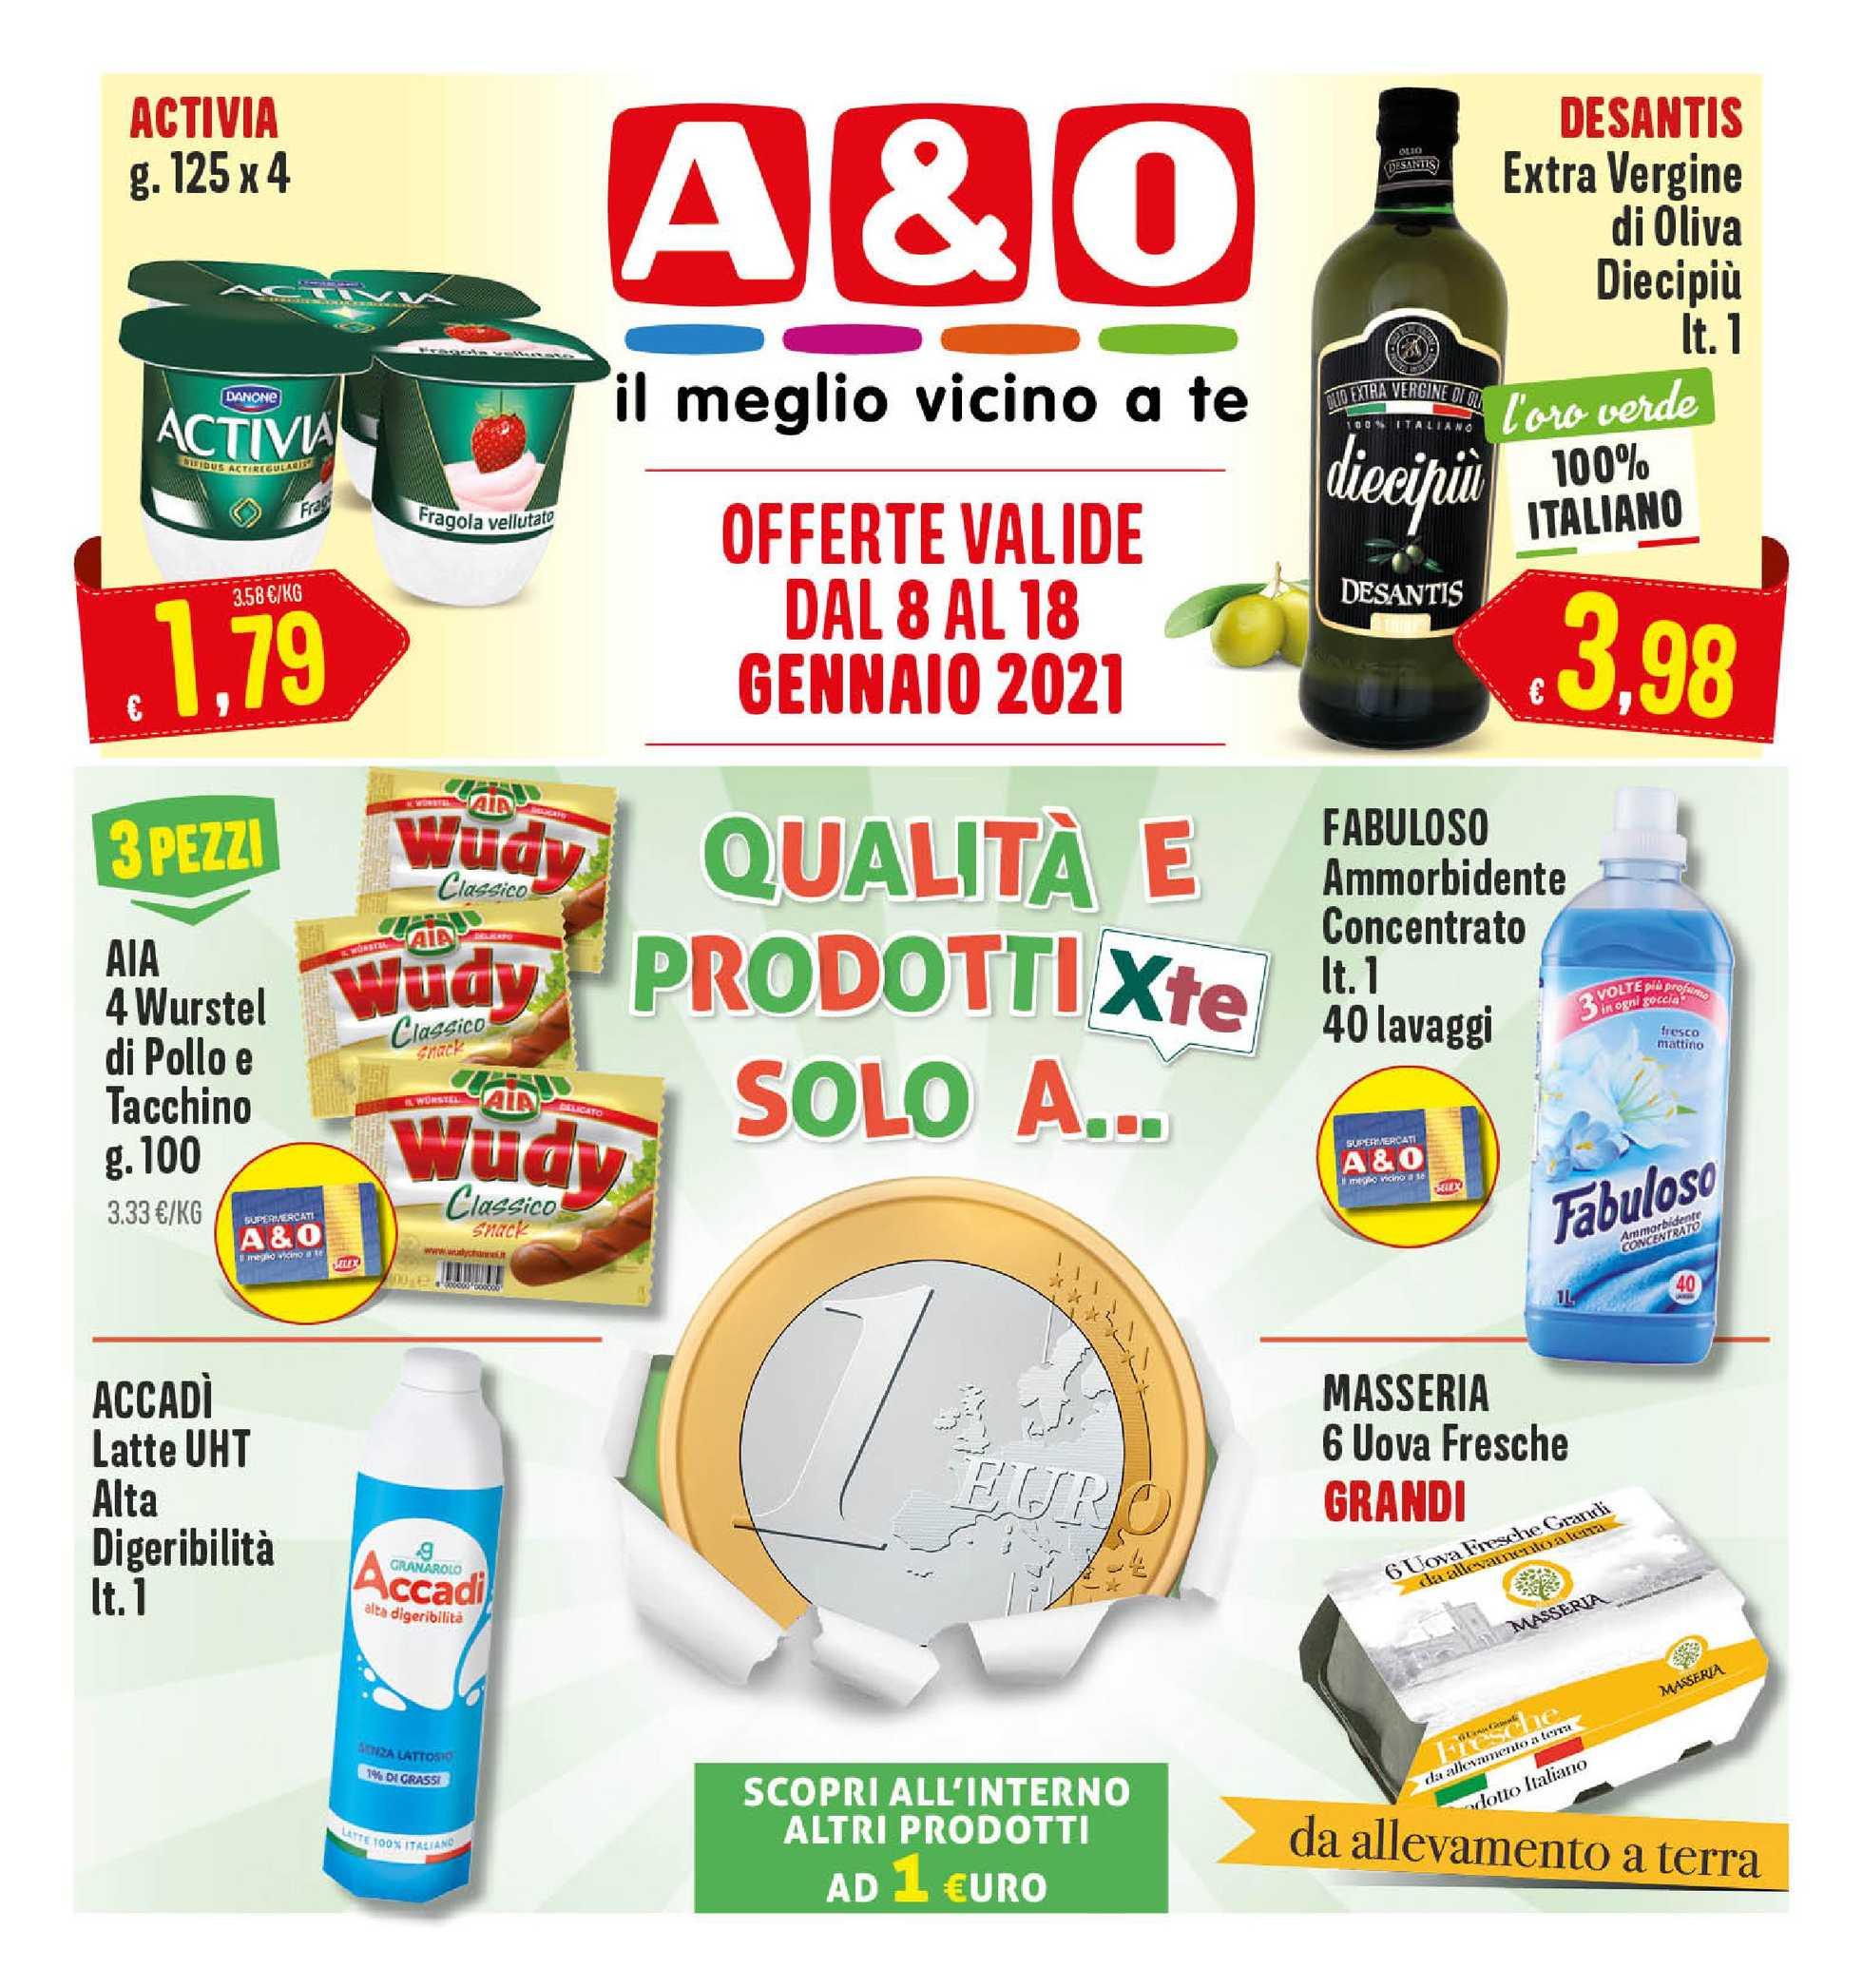 A&O - offerte valide dal 08.01.2021 al 18.01.2021 - pagina 1.